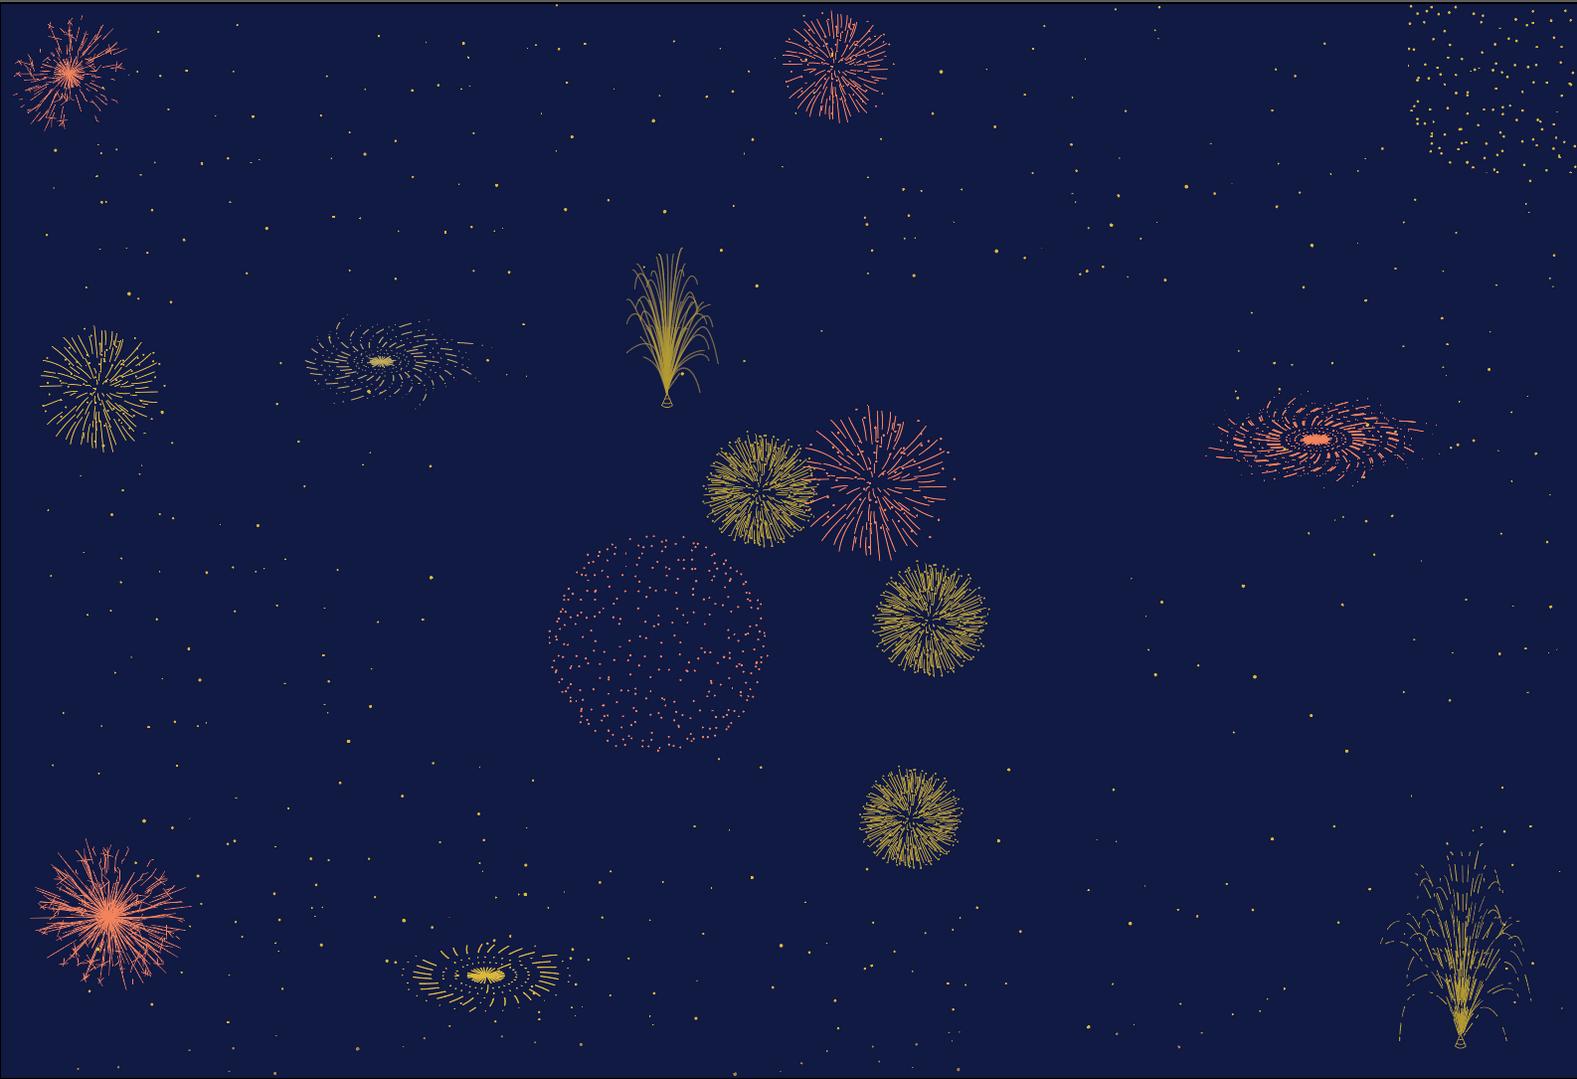 The firework graphics